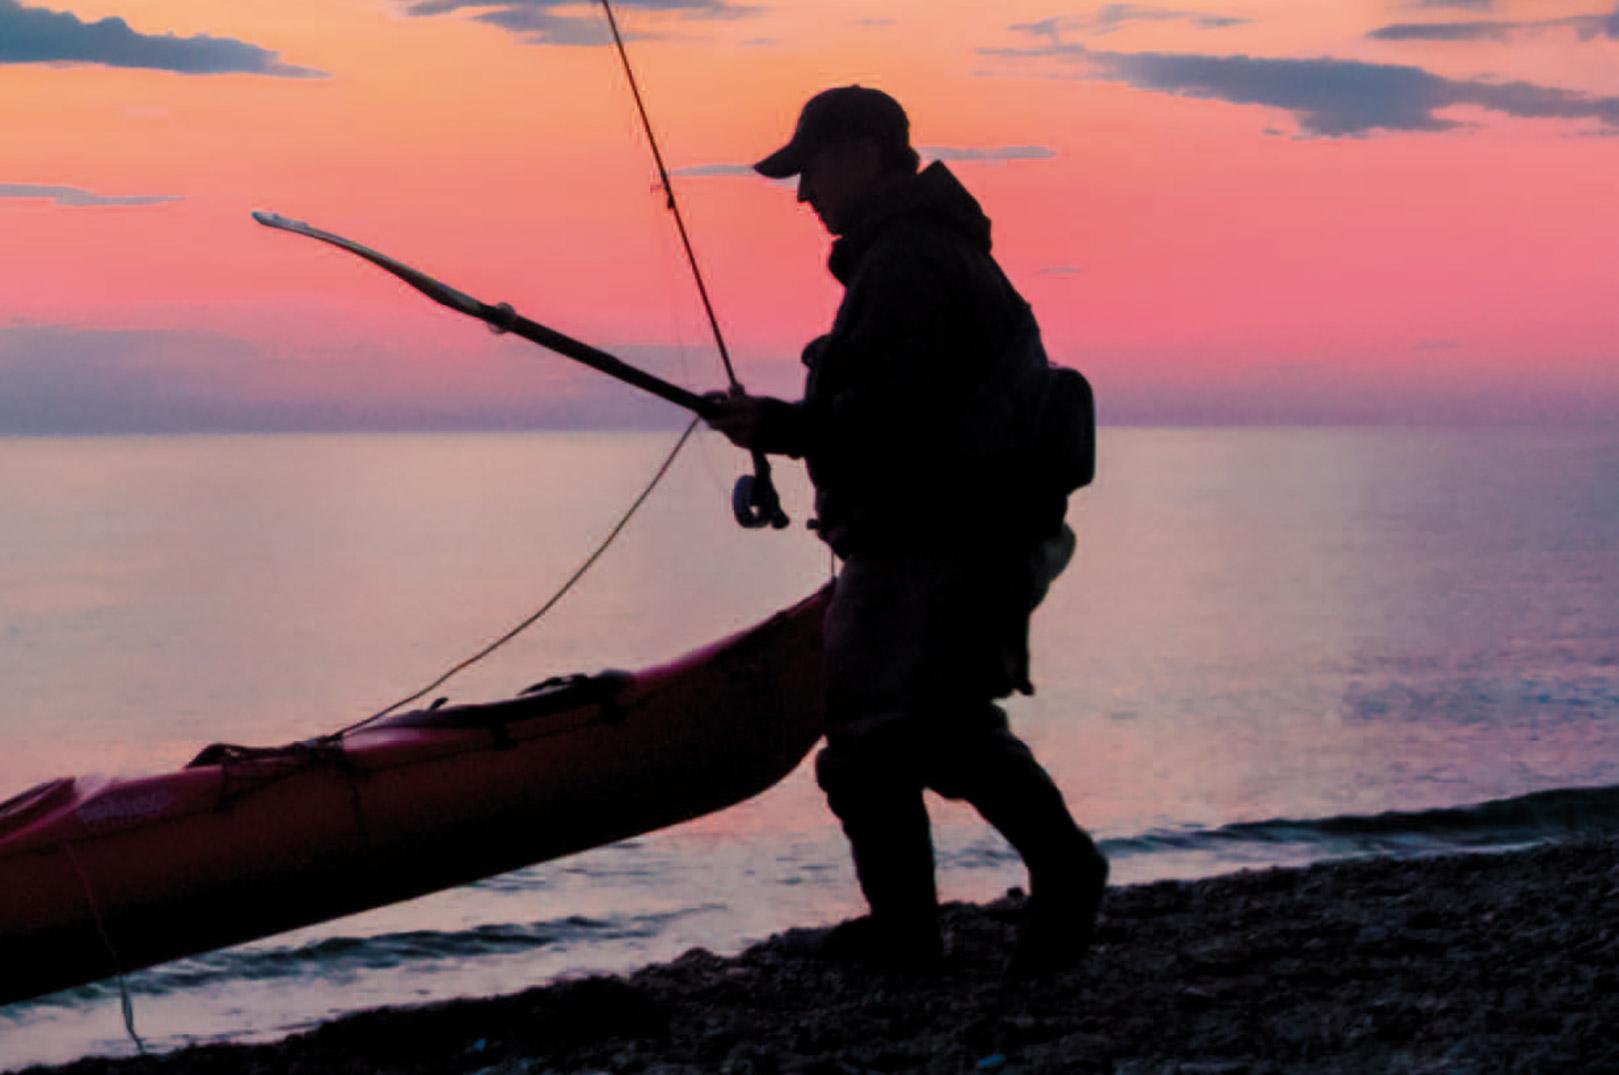 Bo Jensen søsætter sin kajak for at fisike havbars